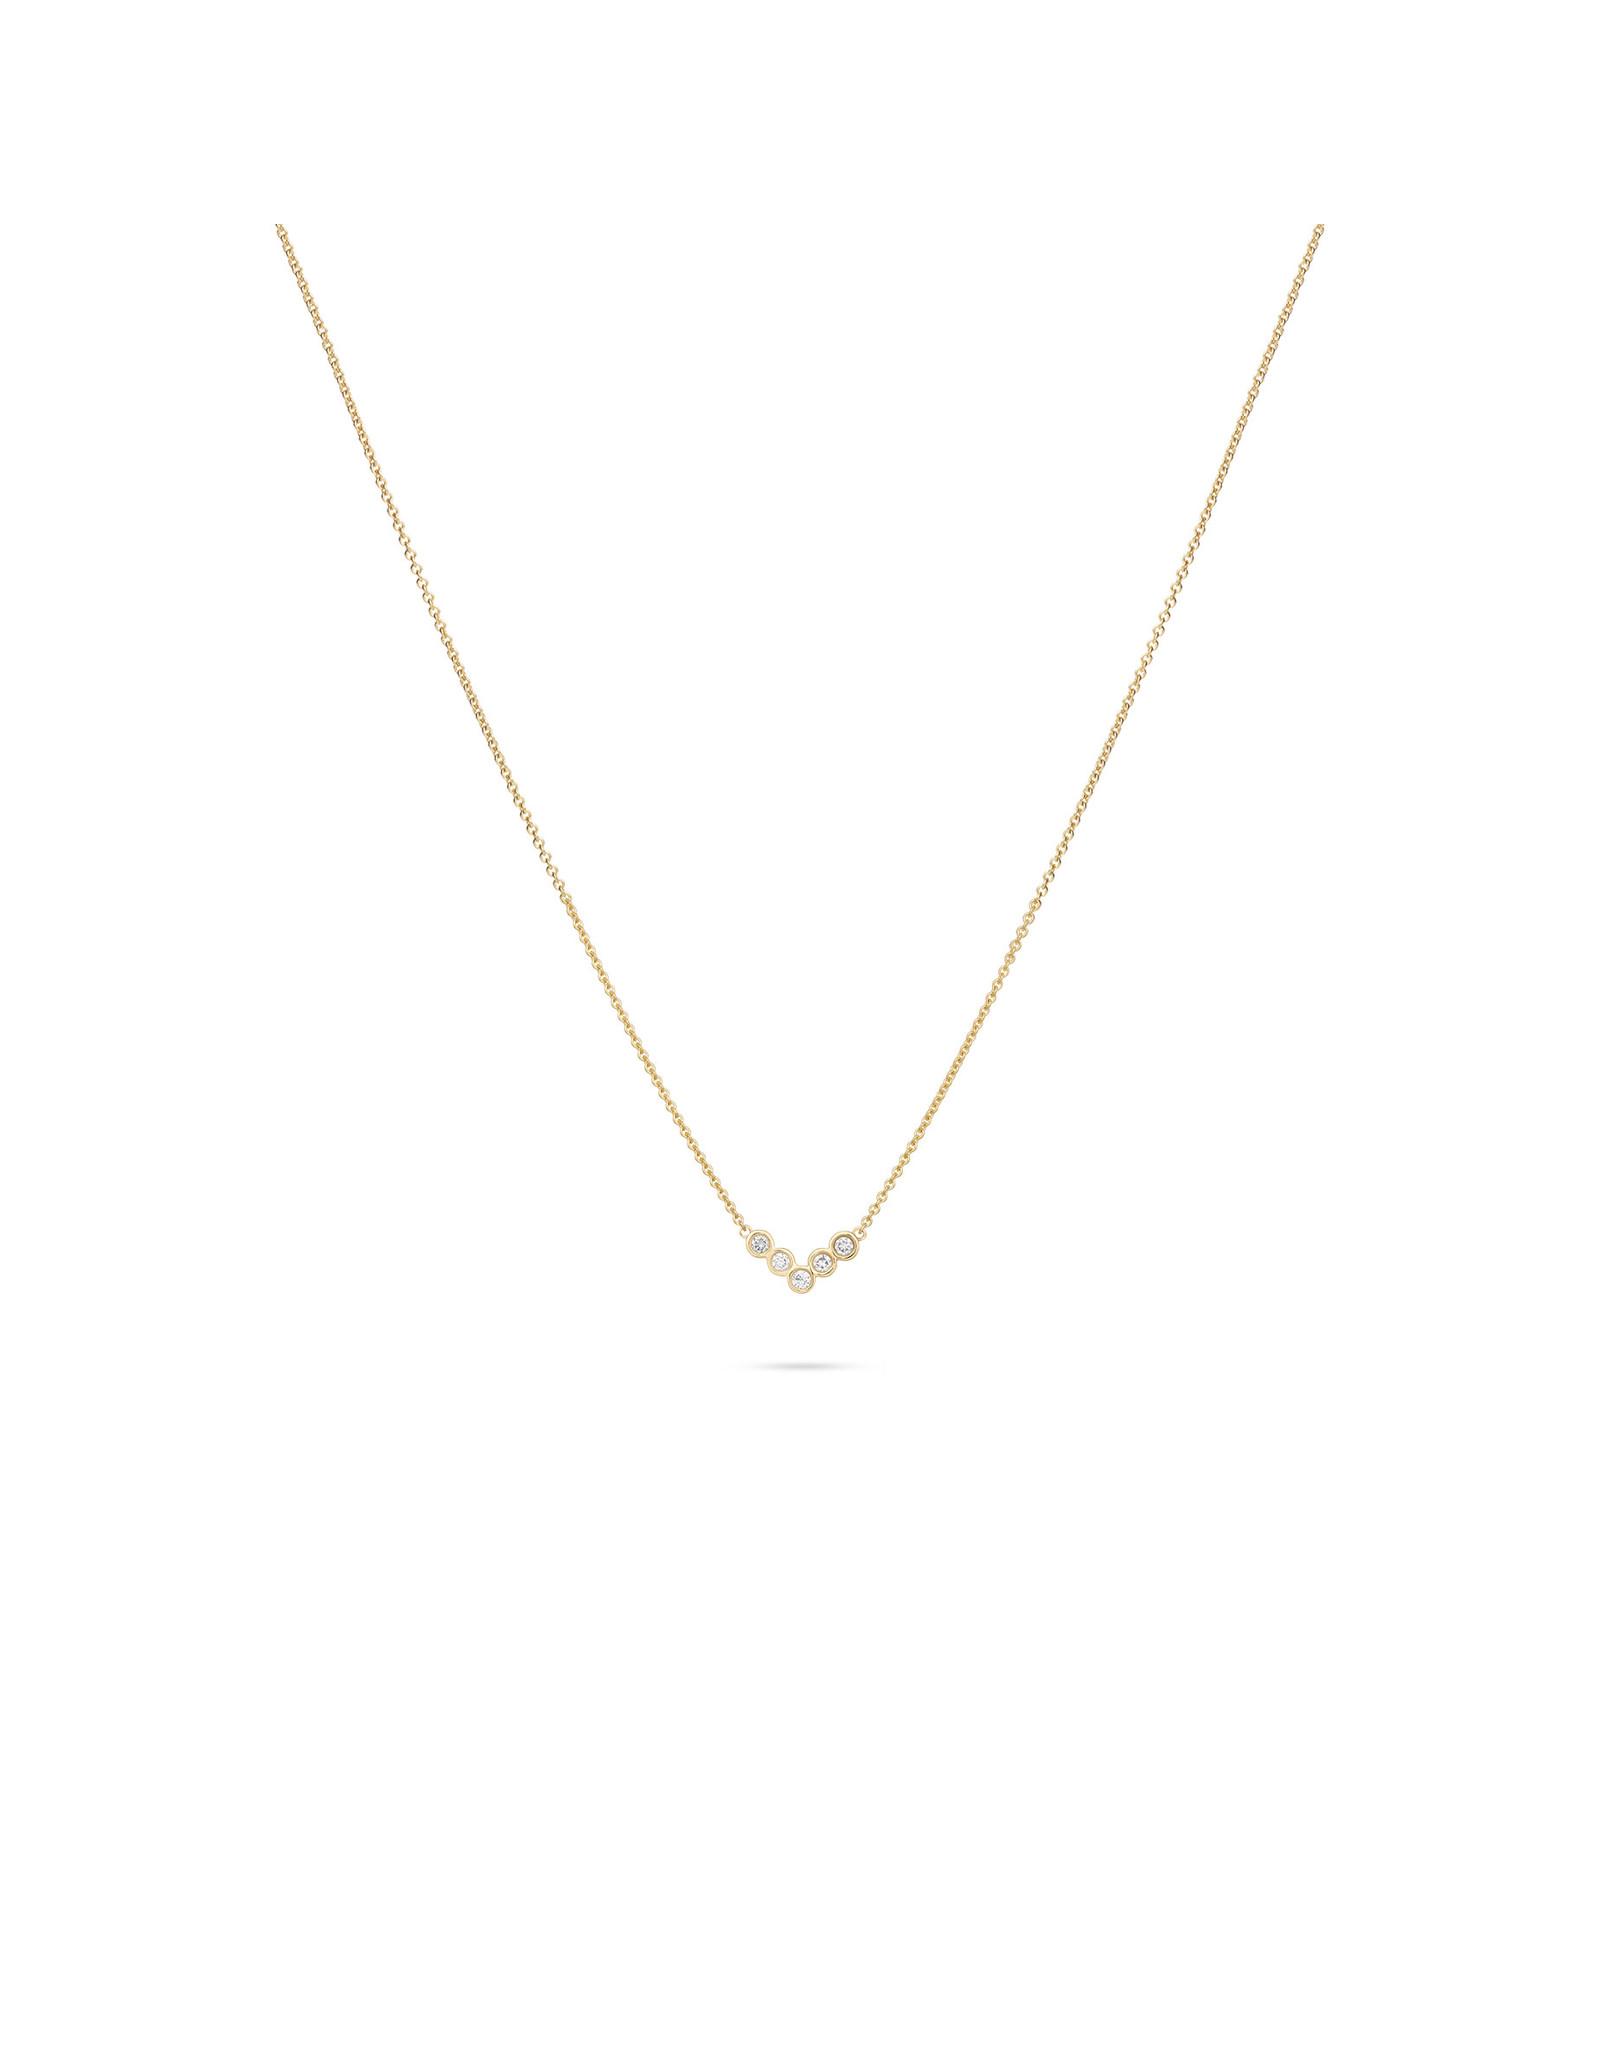 Miss Spring Halsketting Button Geel Goud 18kt MSC545GG-DI Diamant